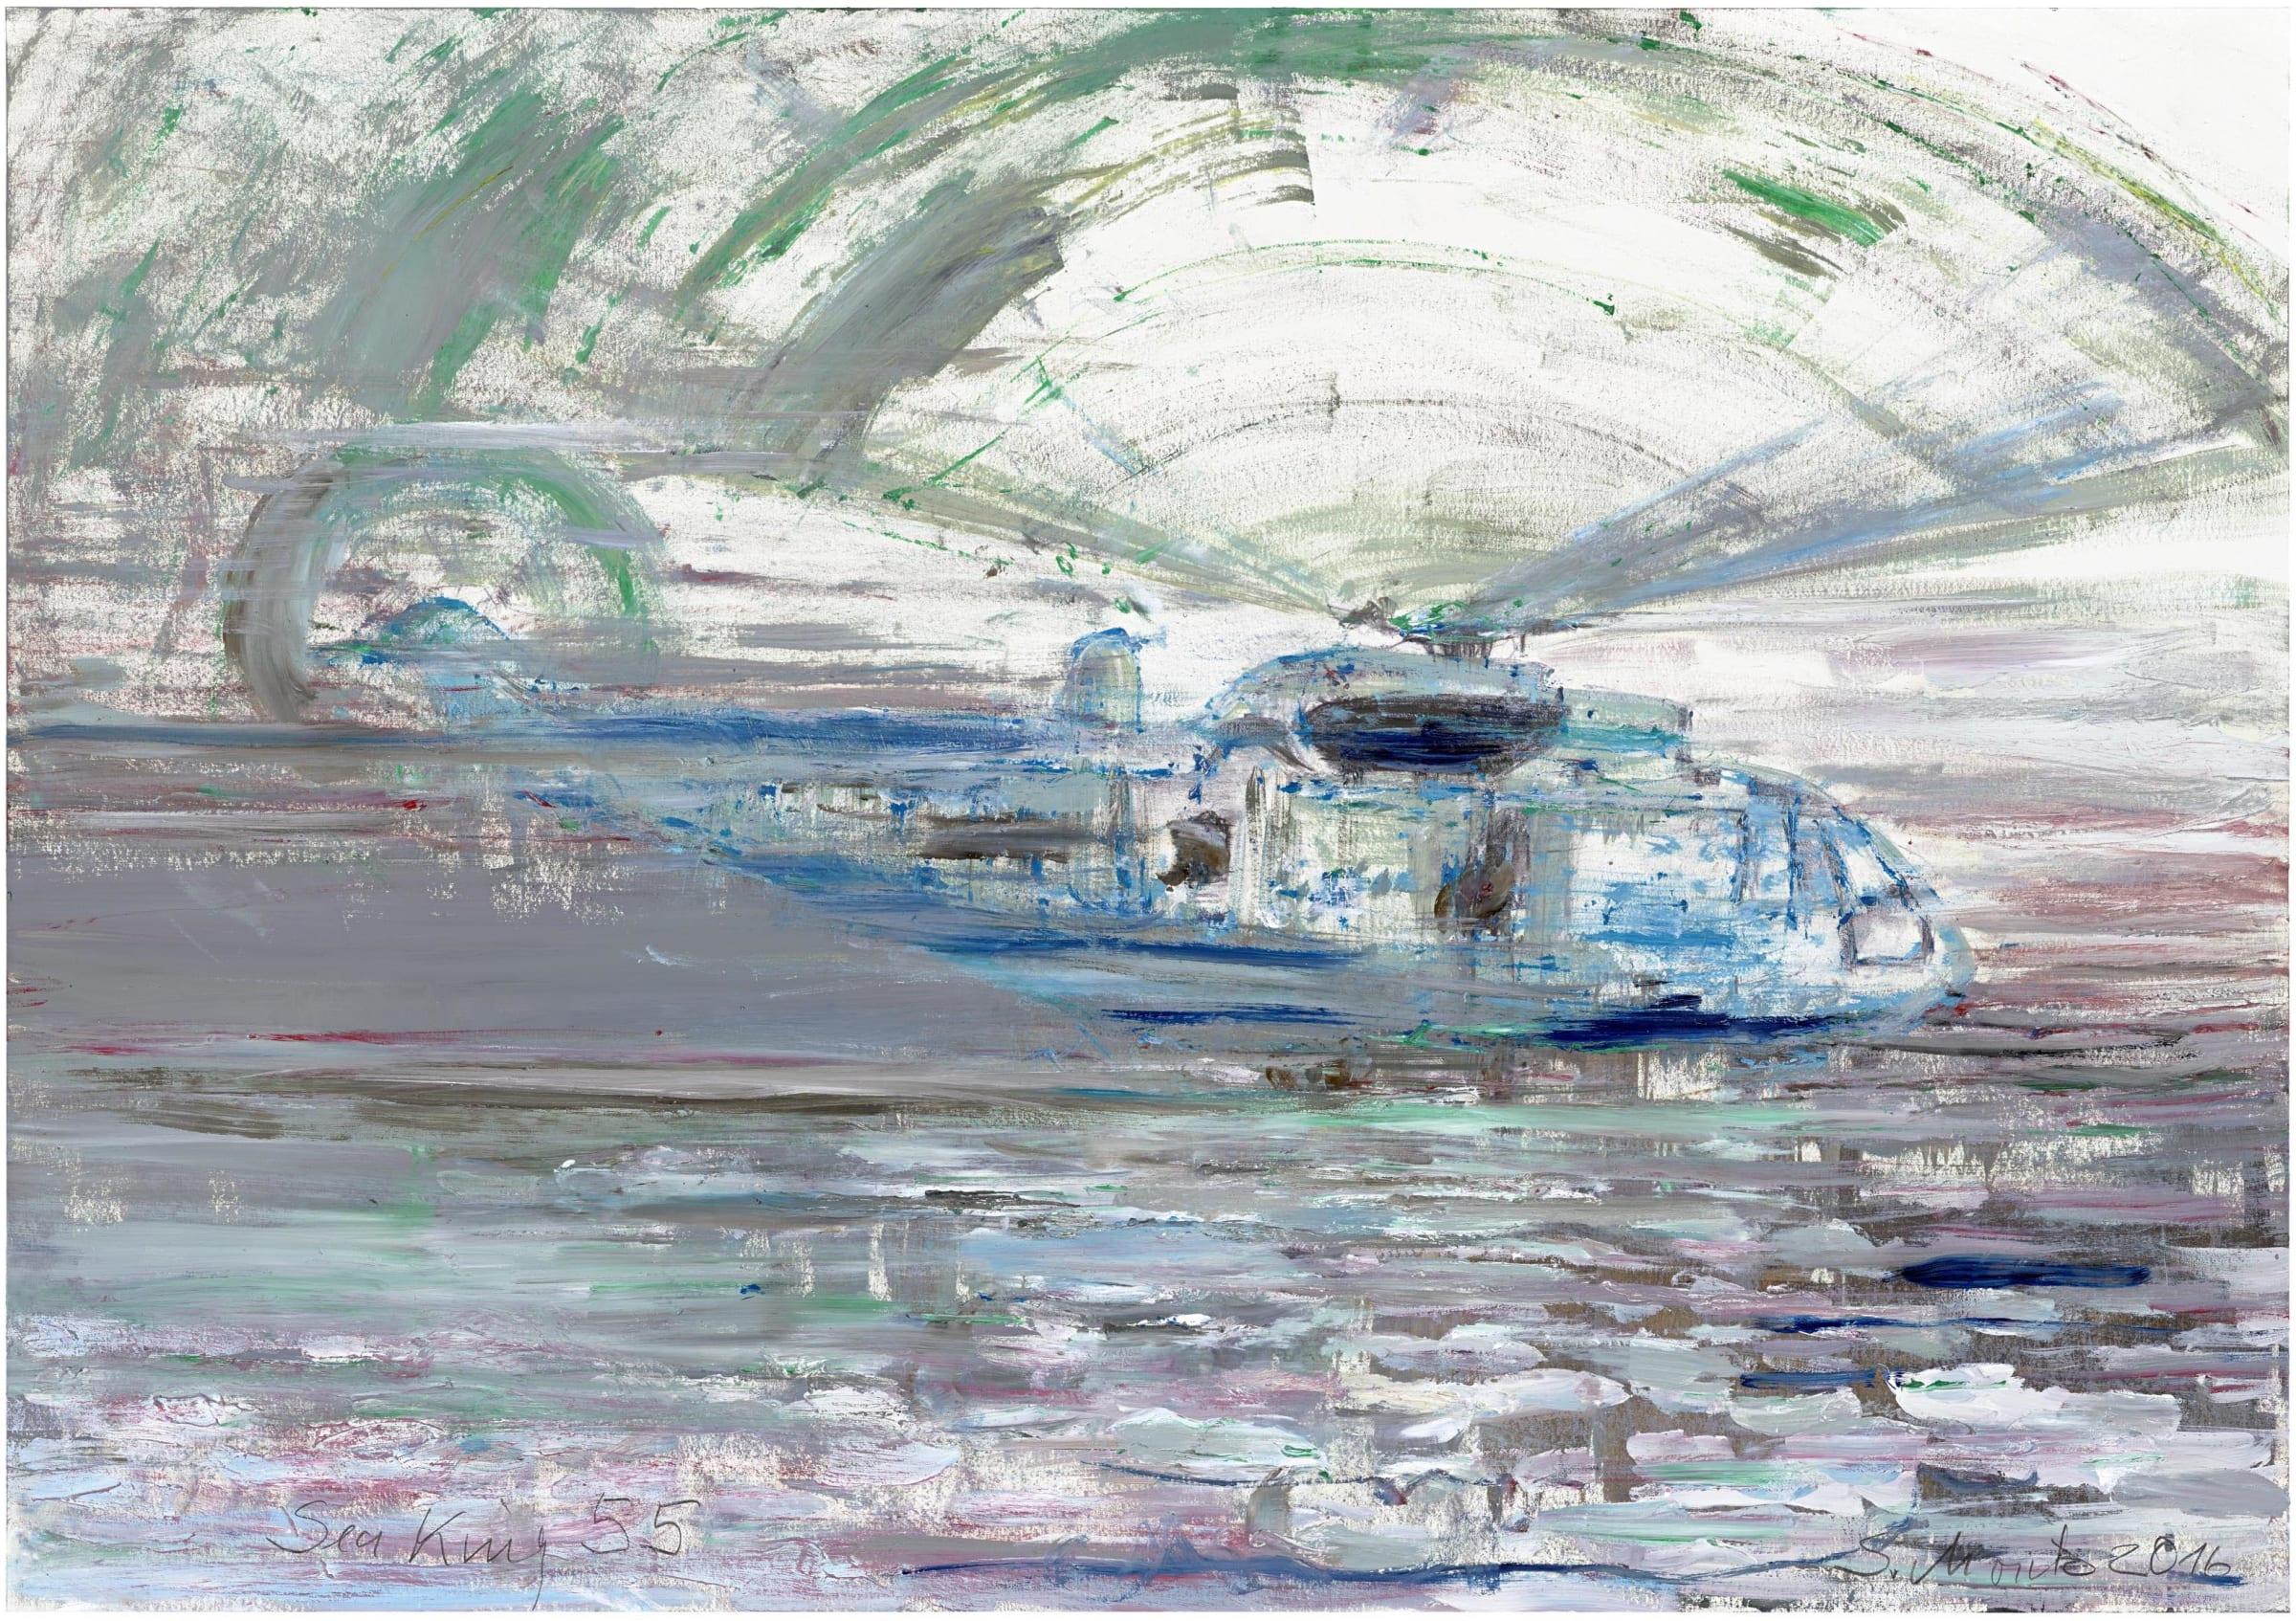 Sabine Moritz, Sea King 55, 2016